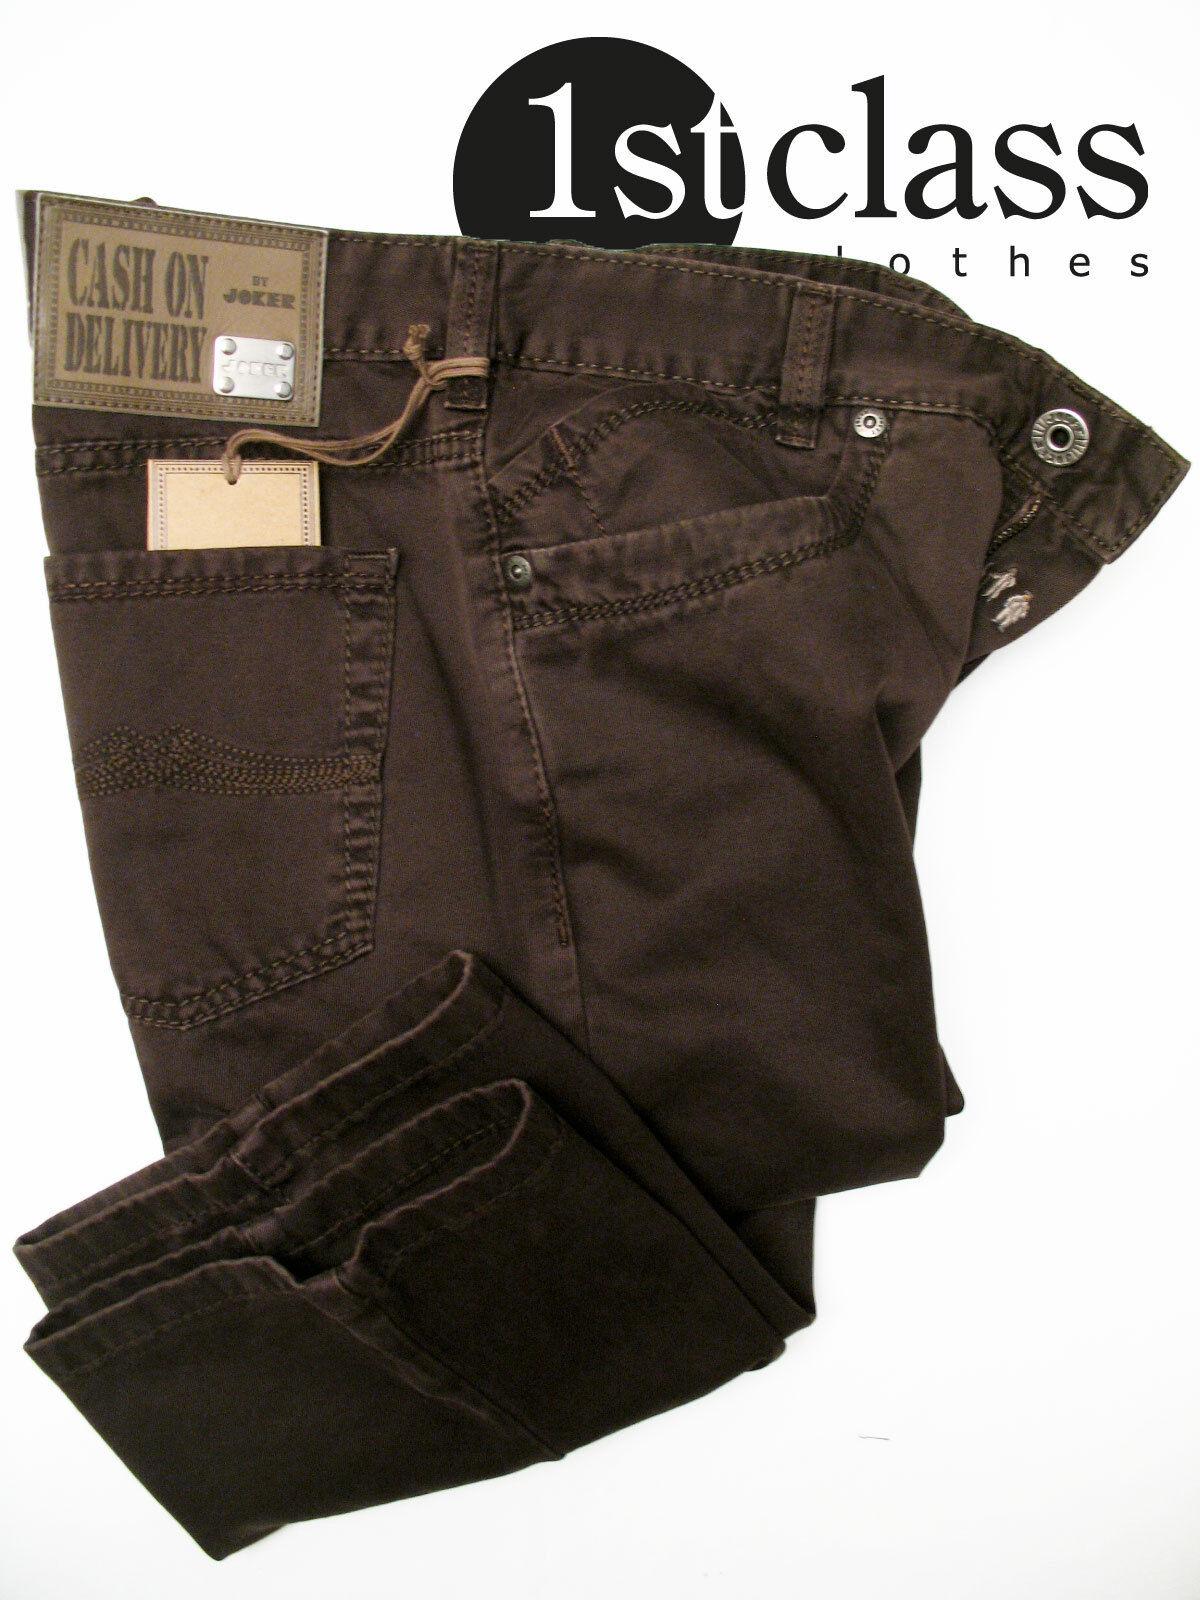 joker jeans freddy 3980 333 dunkelbraun new ebay. Black Bedroom Furniture Sets. Home Design Ideas